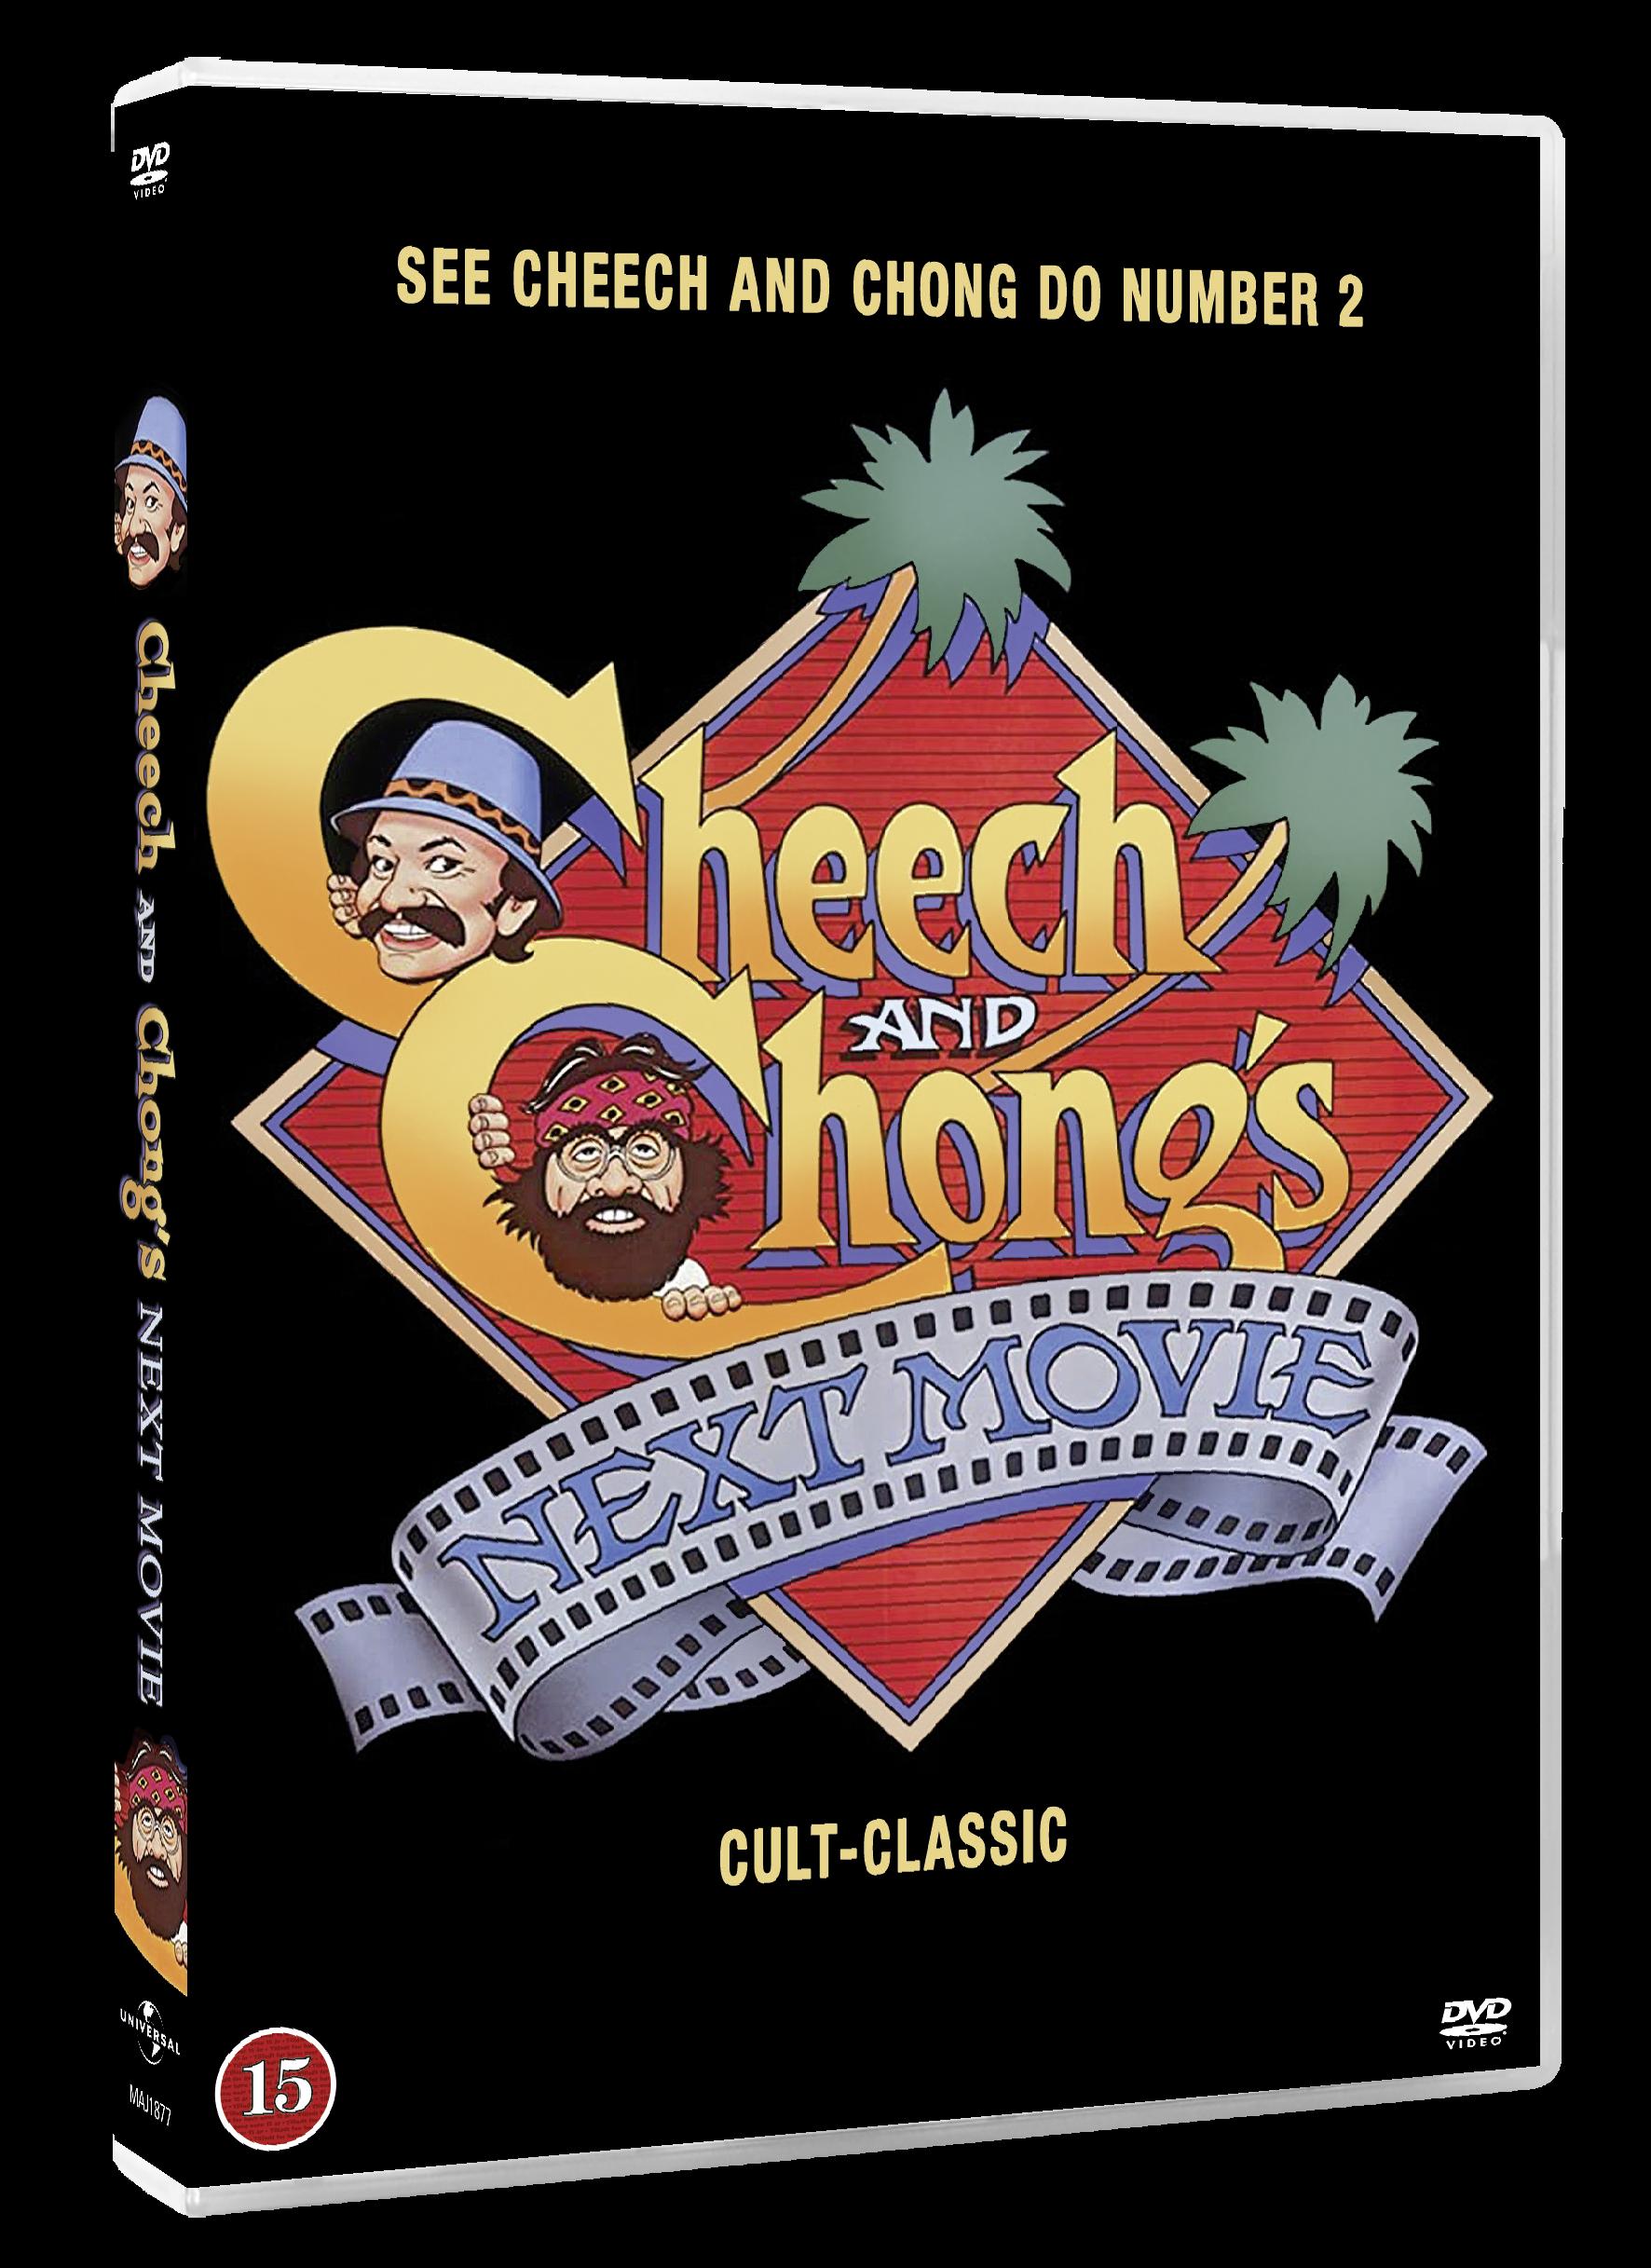 Cheech And Chong's Next Movie